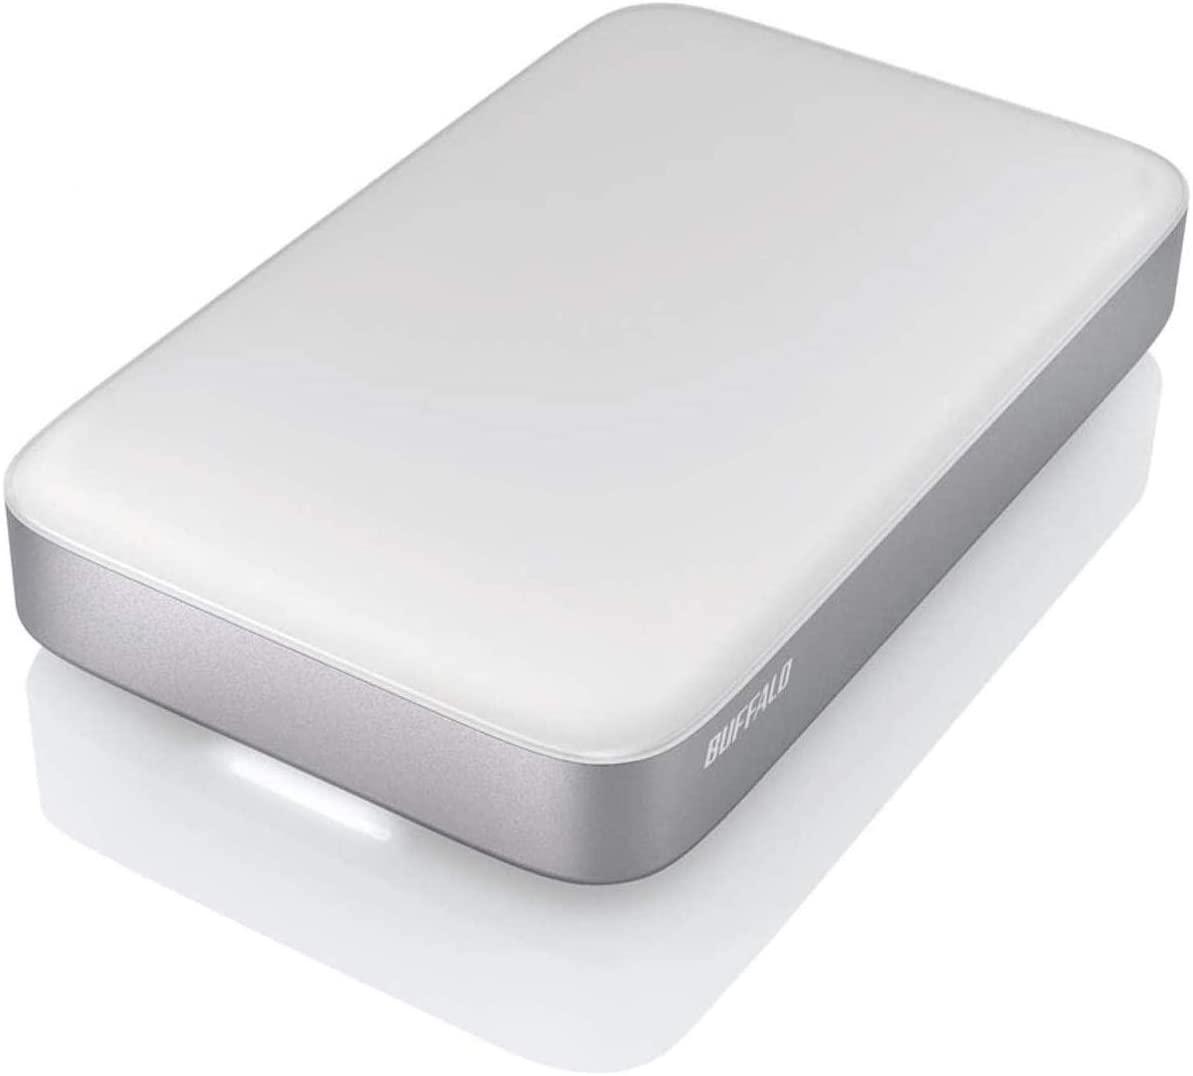 Buffalo MiniStation Thunderbolt USB 3.0 2 TB Portable Hard Drive (HD-PA2.0TU3),Silver